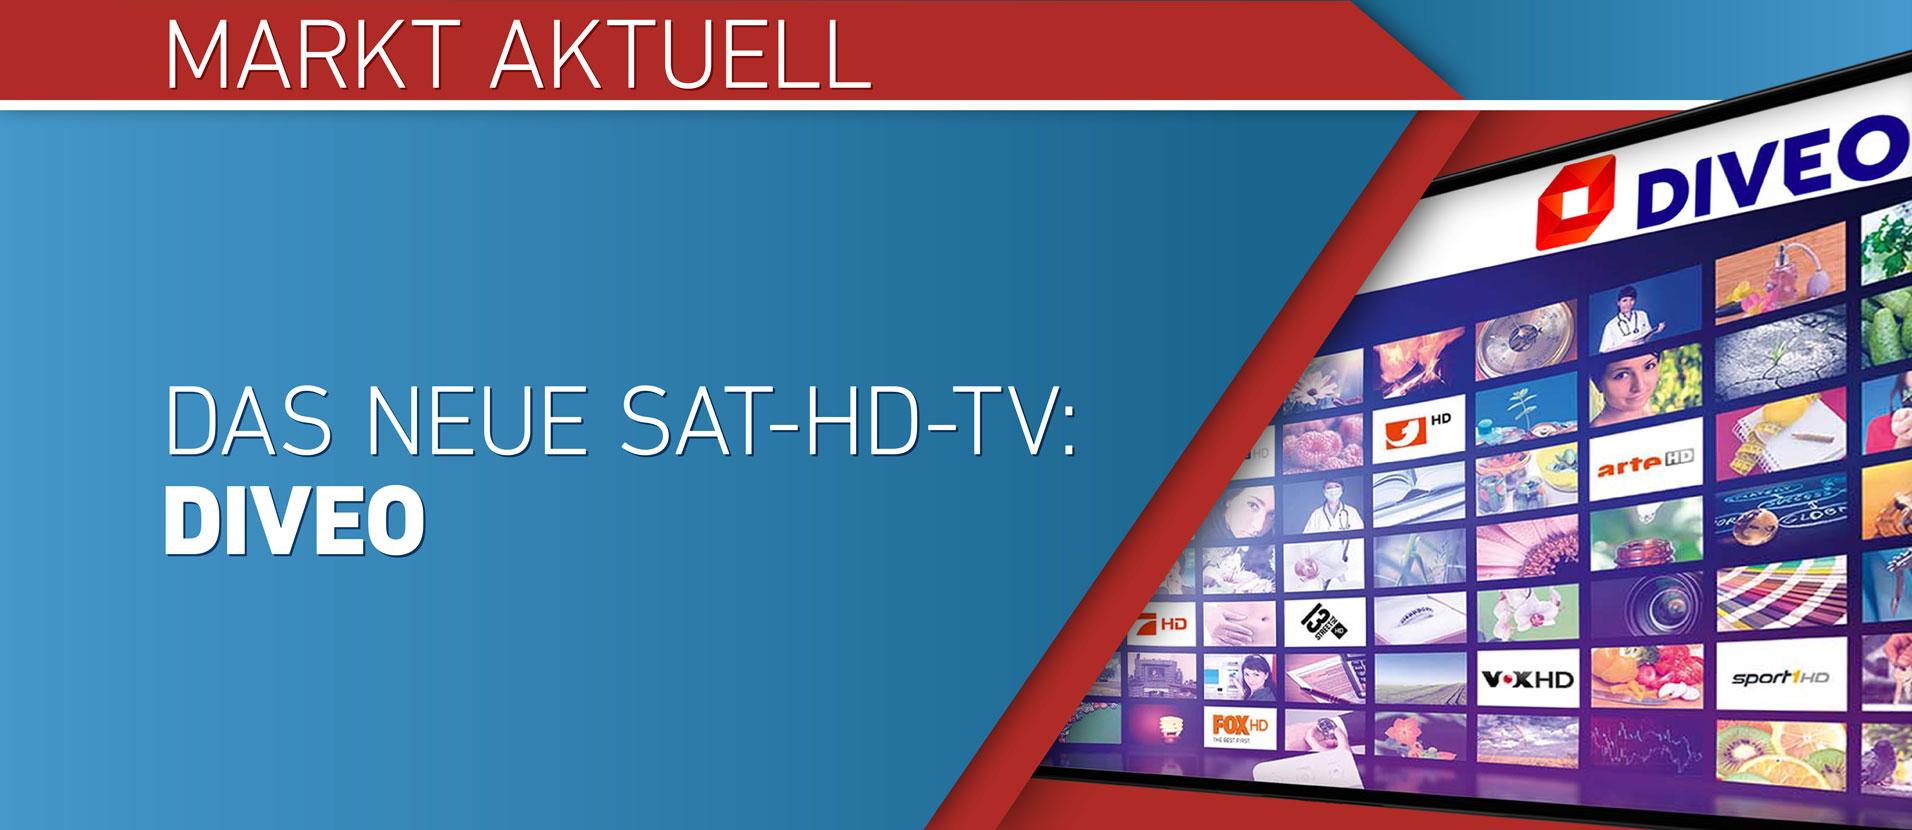 Das neue Sat-HD-TV: DIVEO